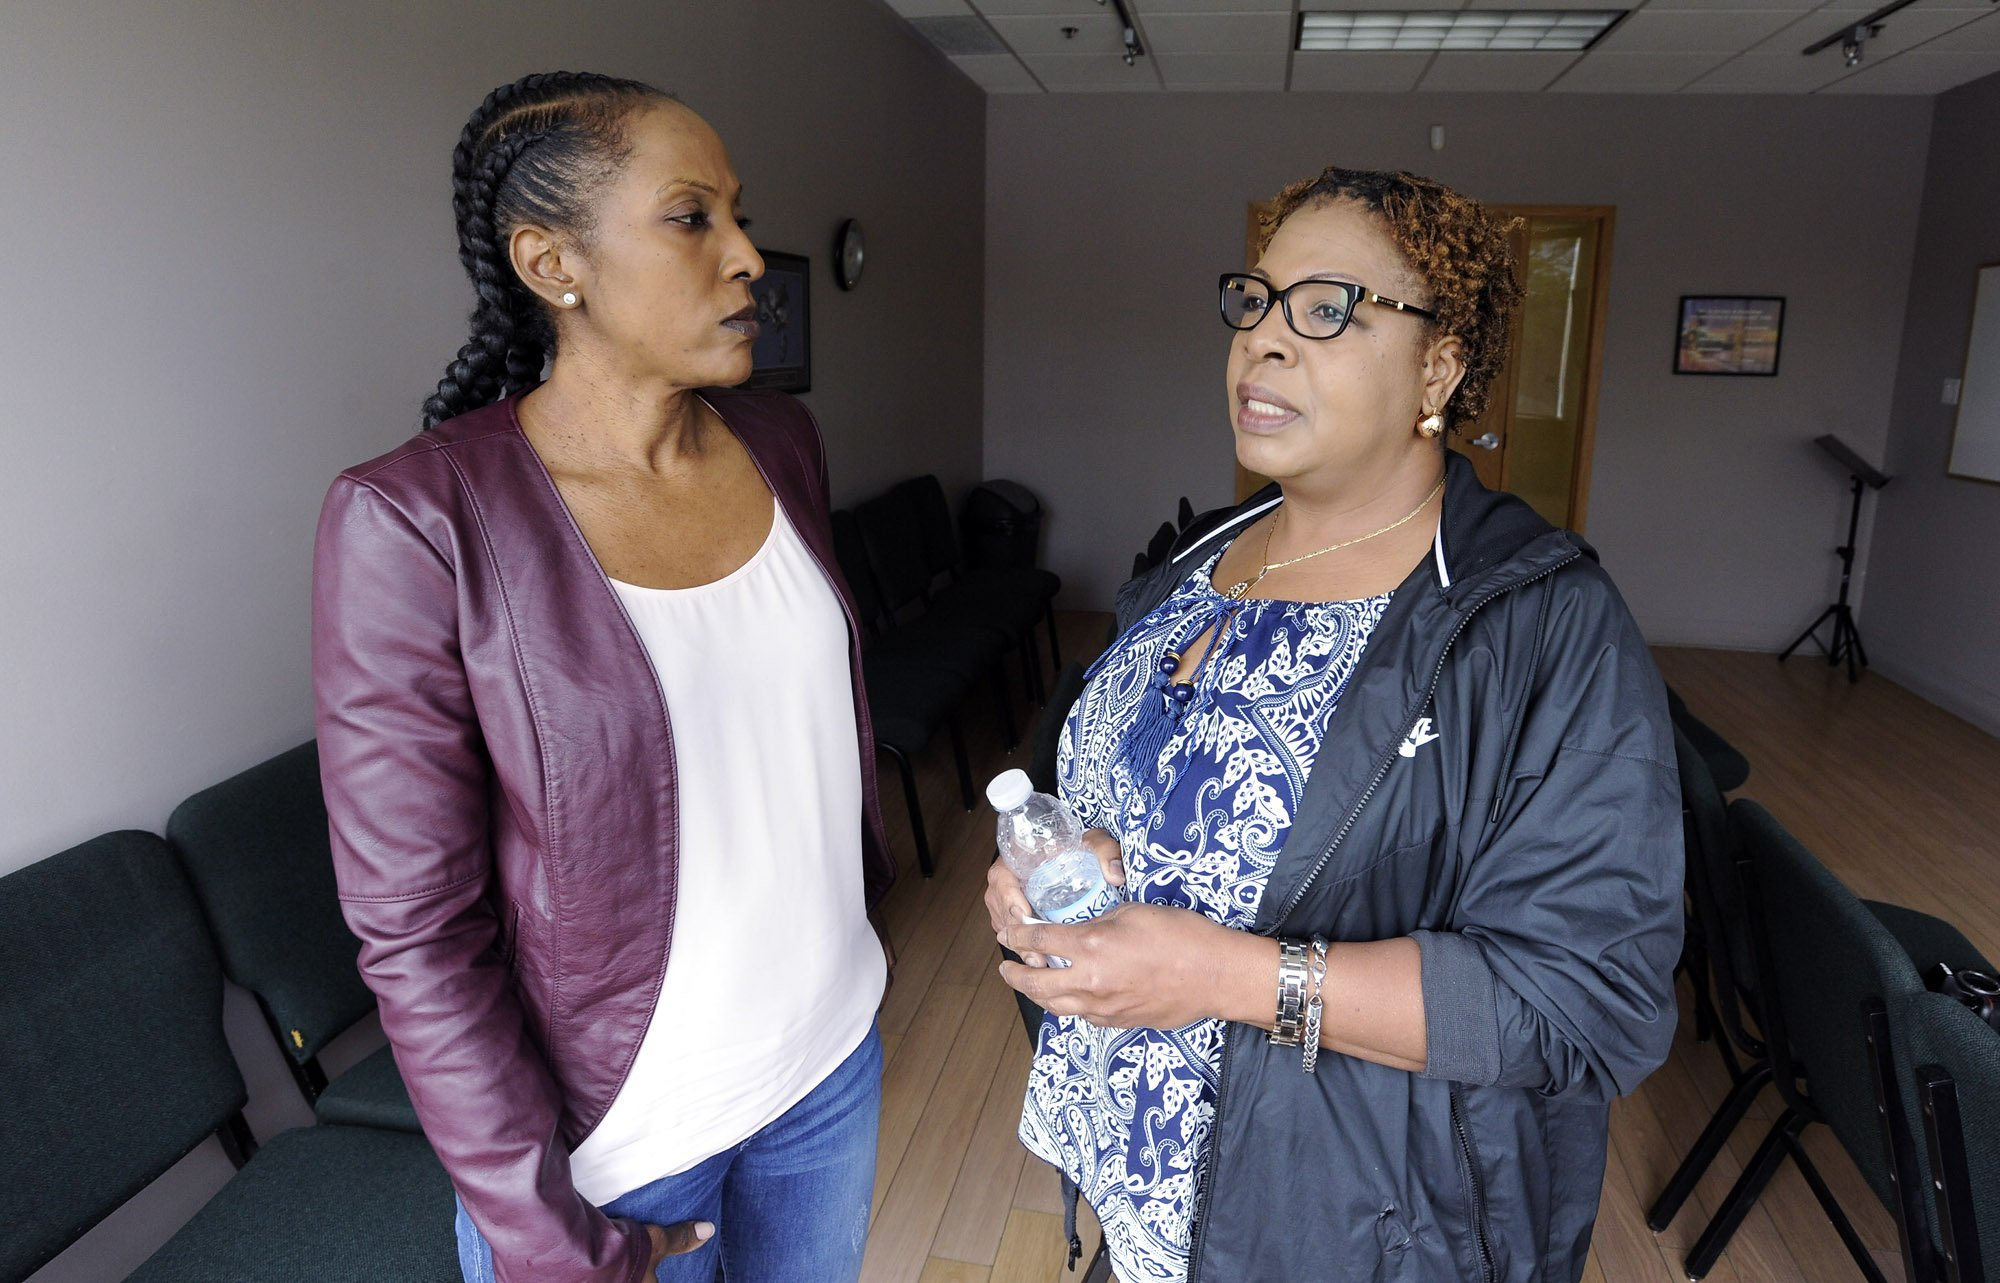 Family seeks answers in shooting death of Etobicoke man Blain